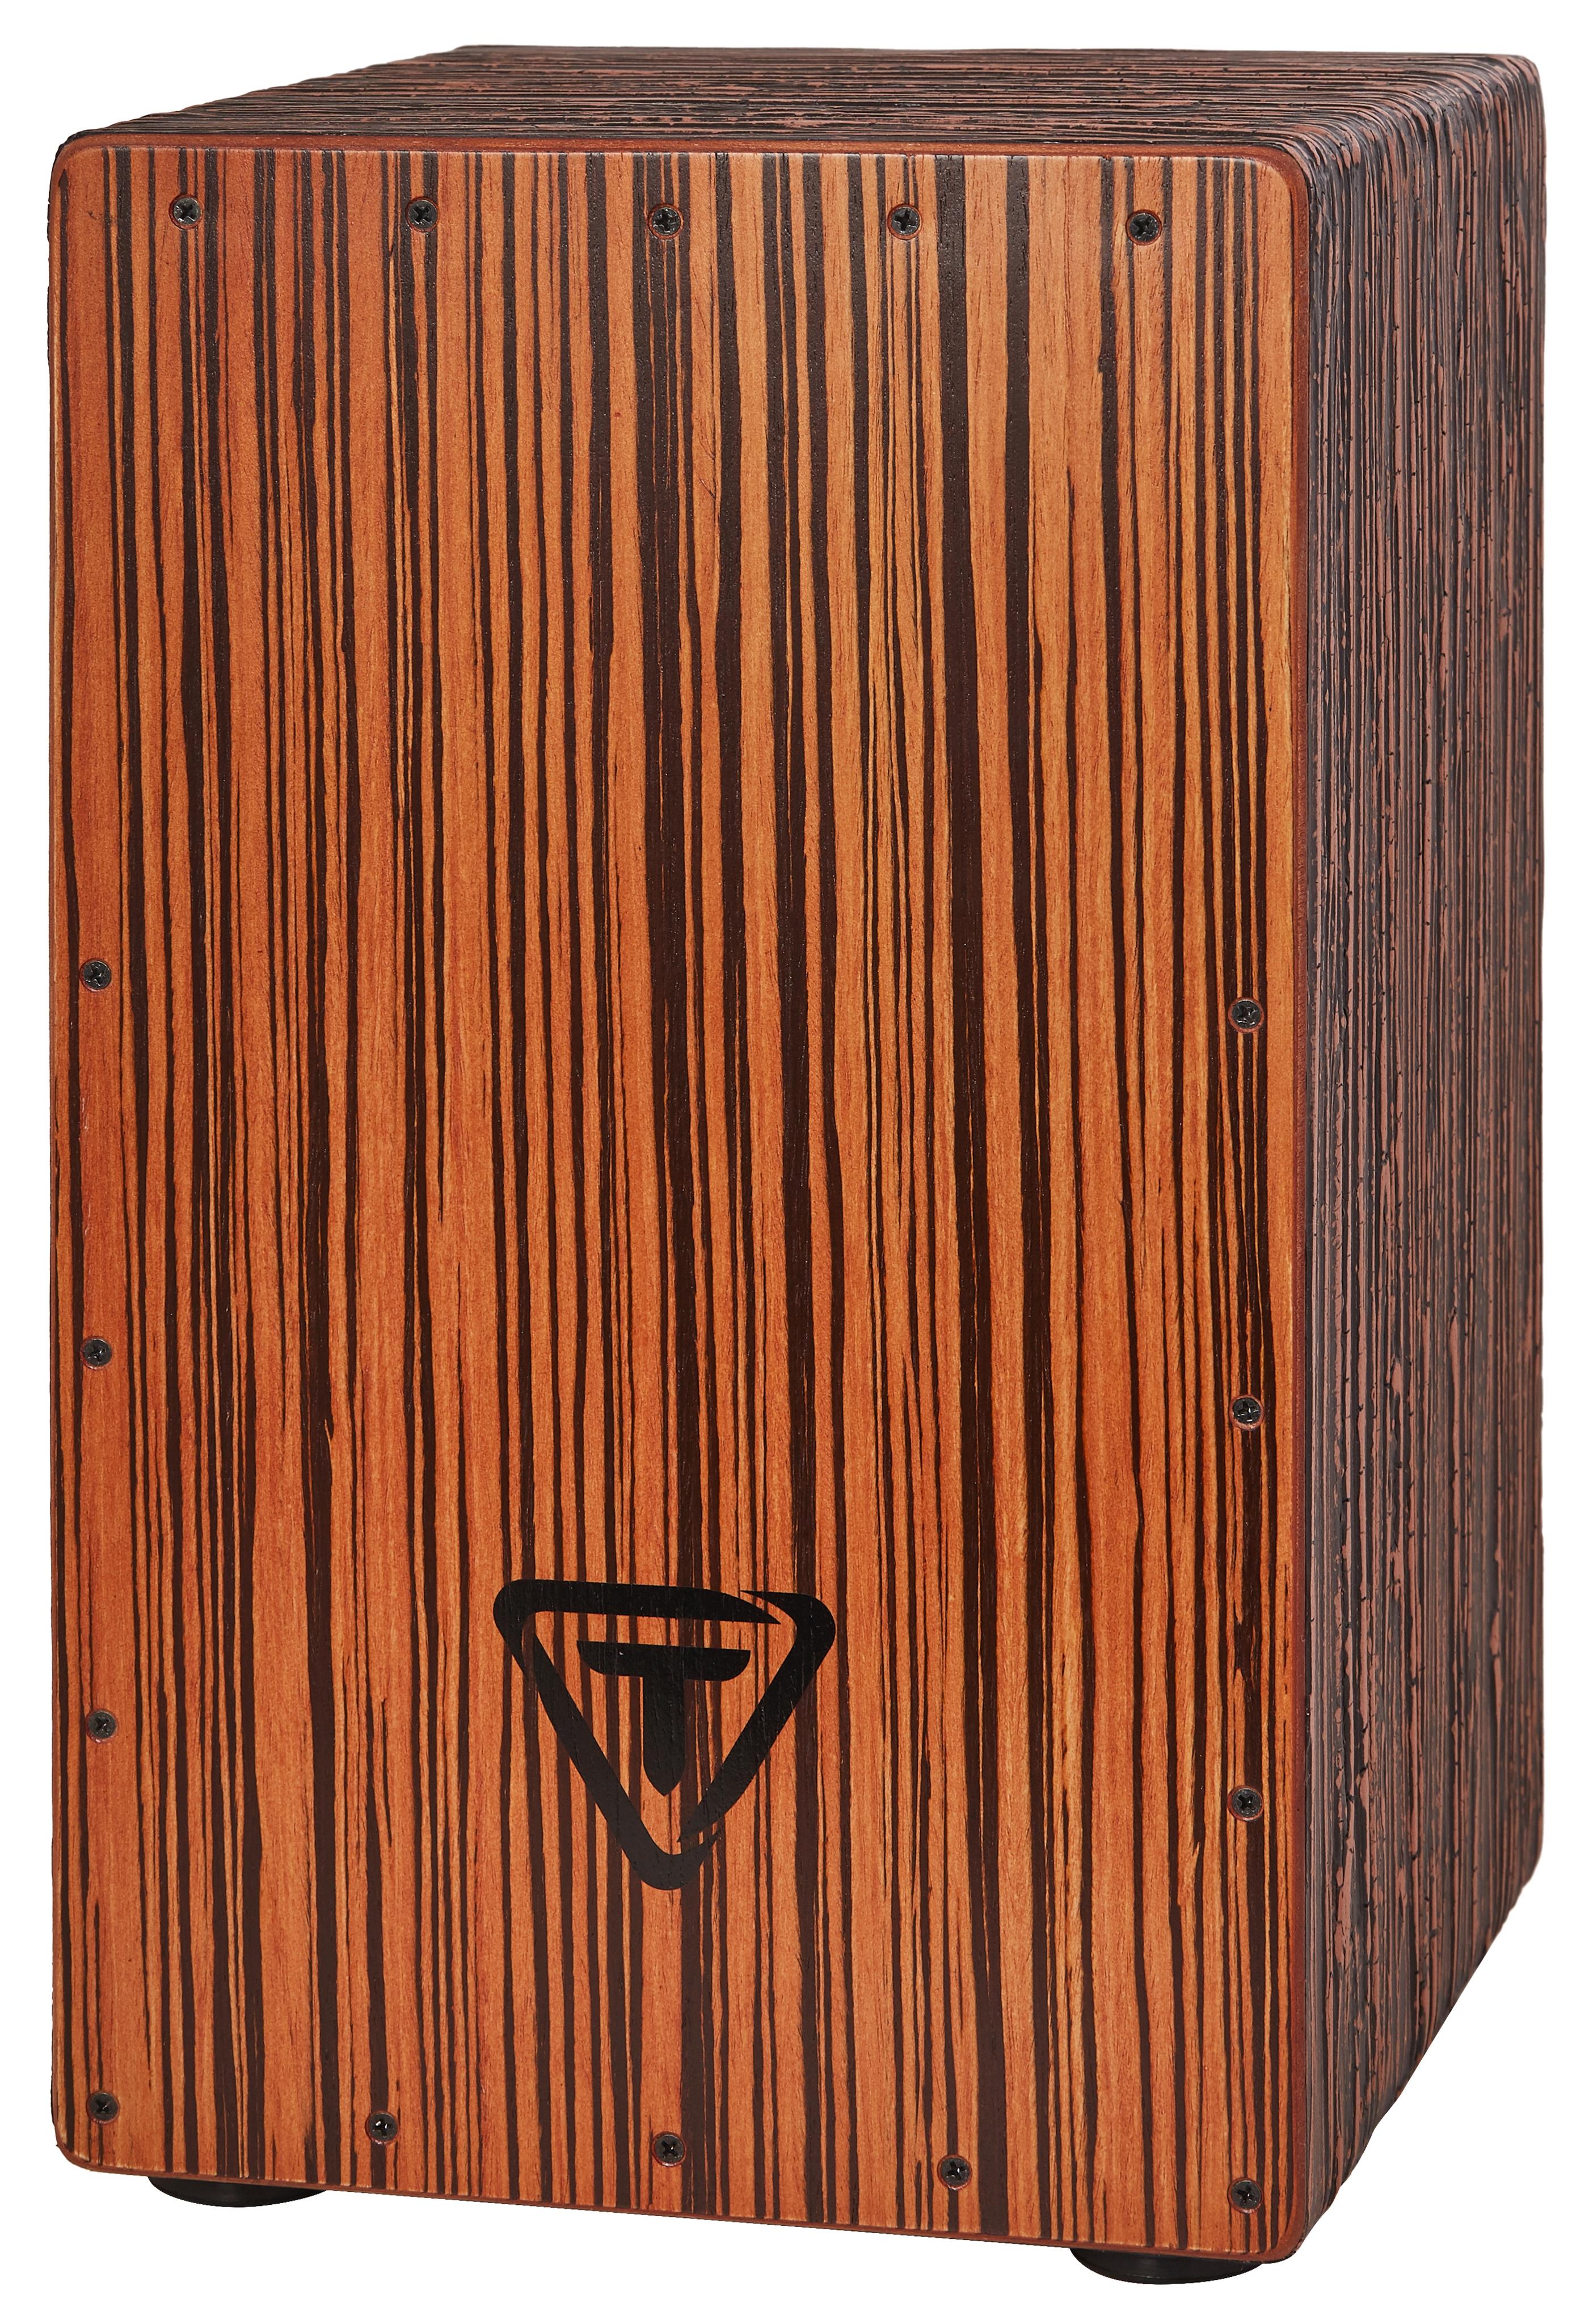 TYCOON STKS-29 LW Supremo Select Lava Wood